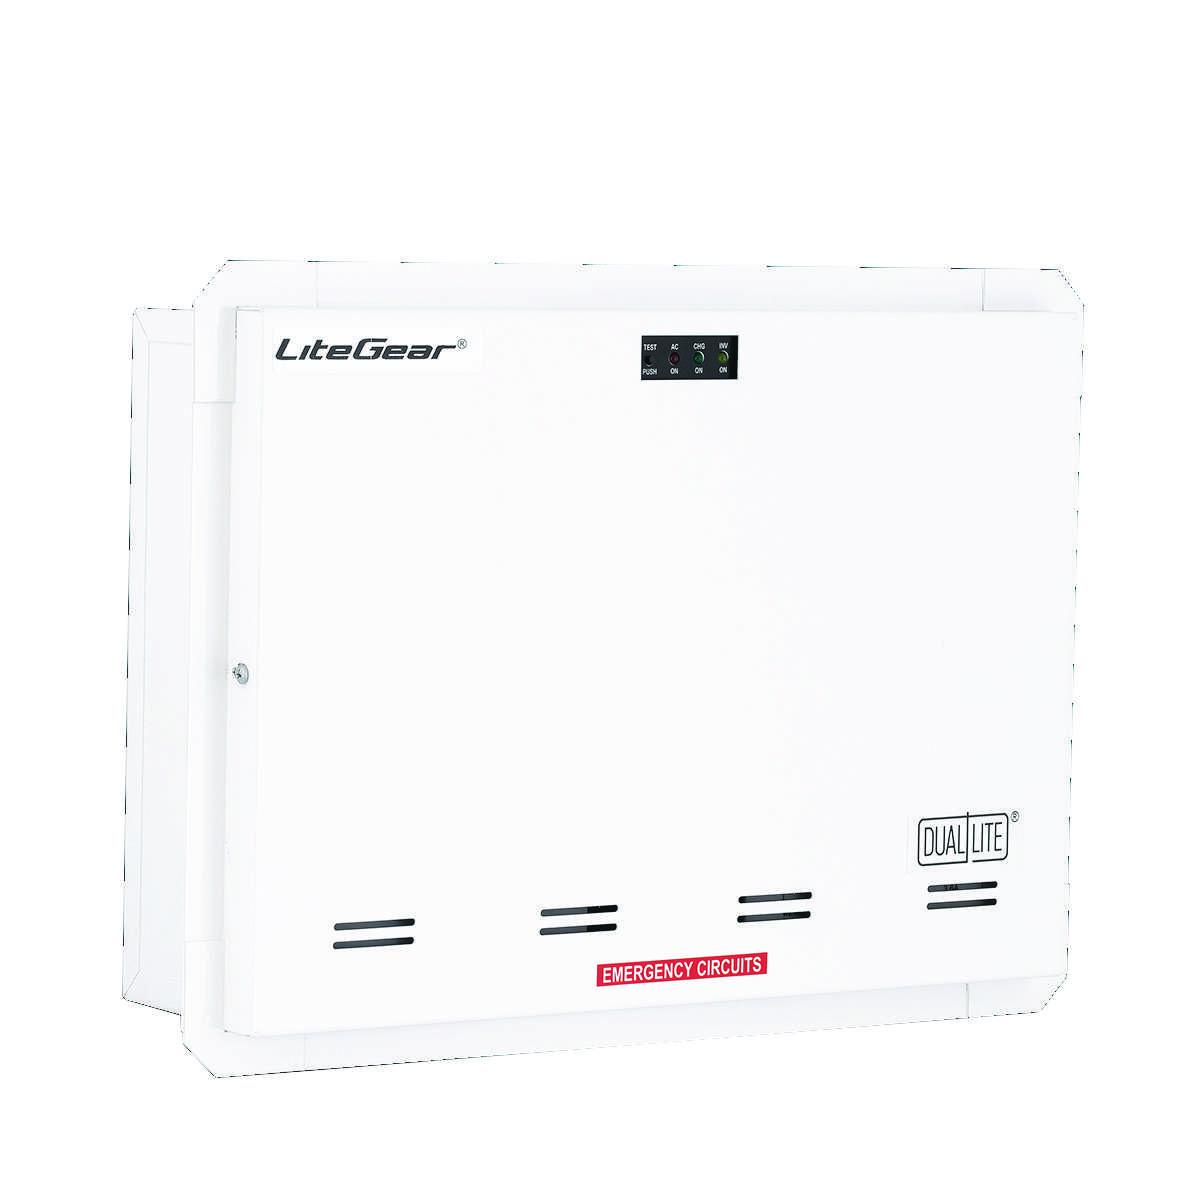 Litegear Series Central Lighting Inverters Emergency Exit Single Switch Application Use Normal Light As Click Dl Lg Prodimage Lg125r Lg125s Lg125t